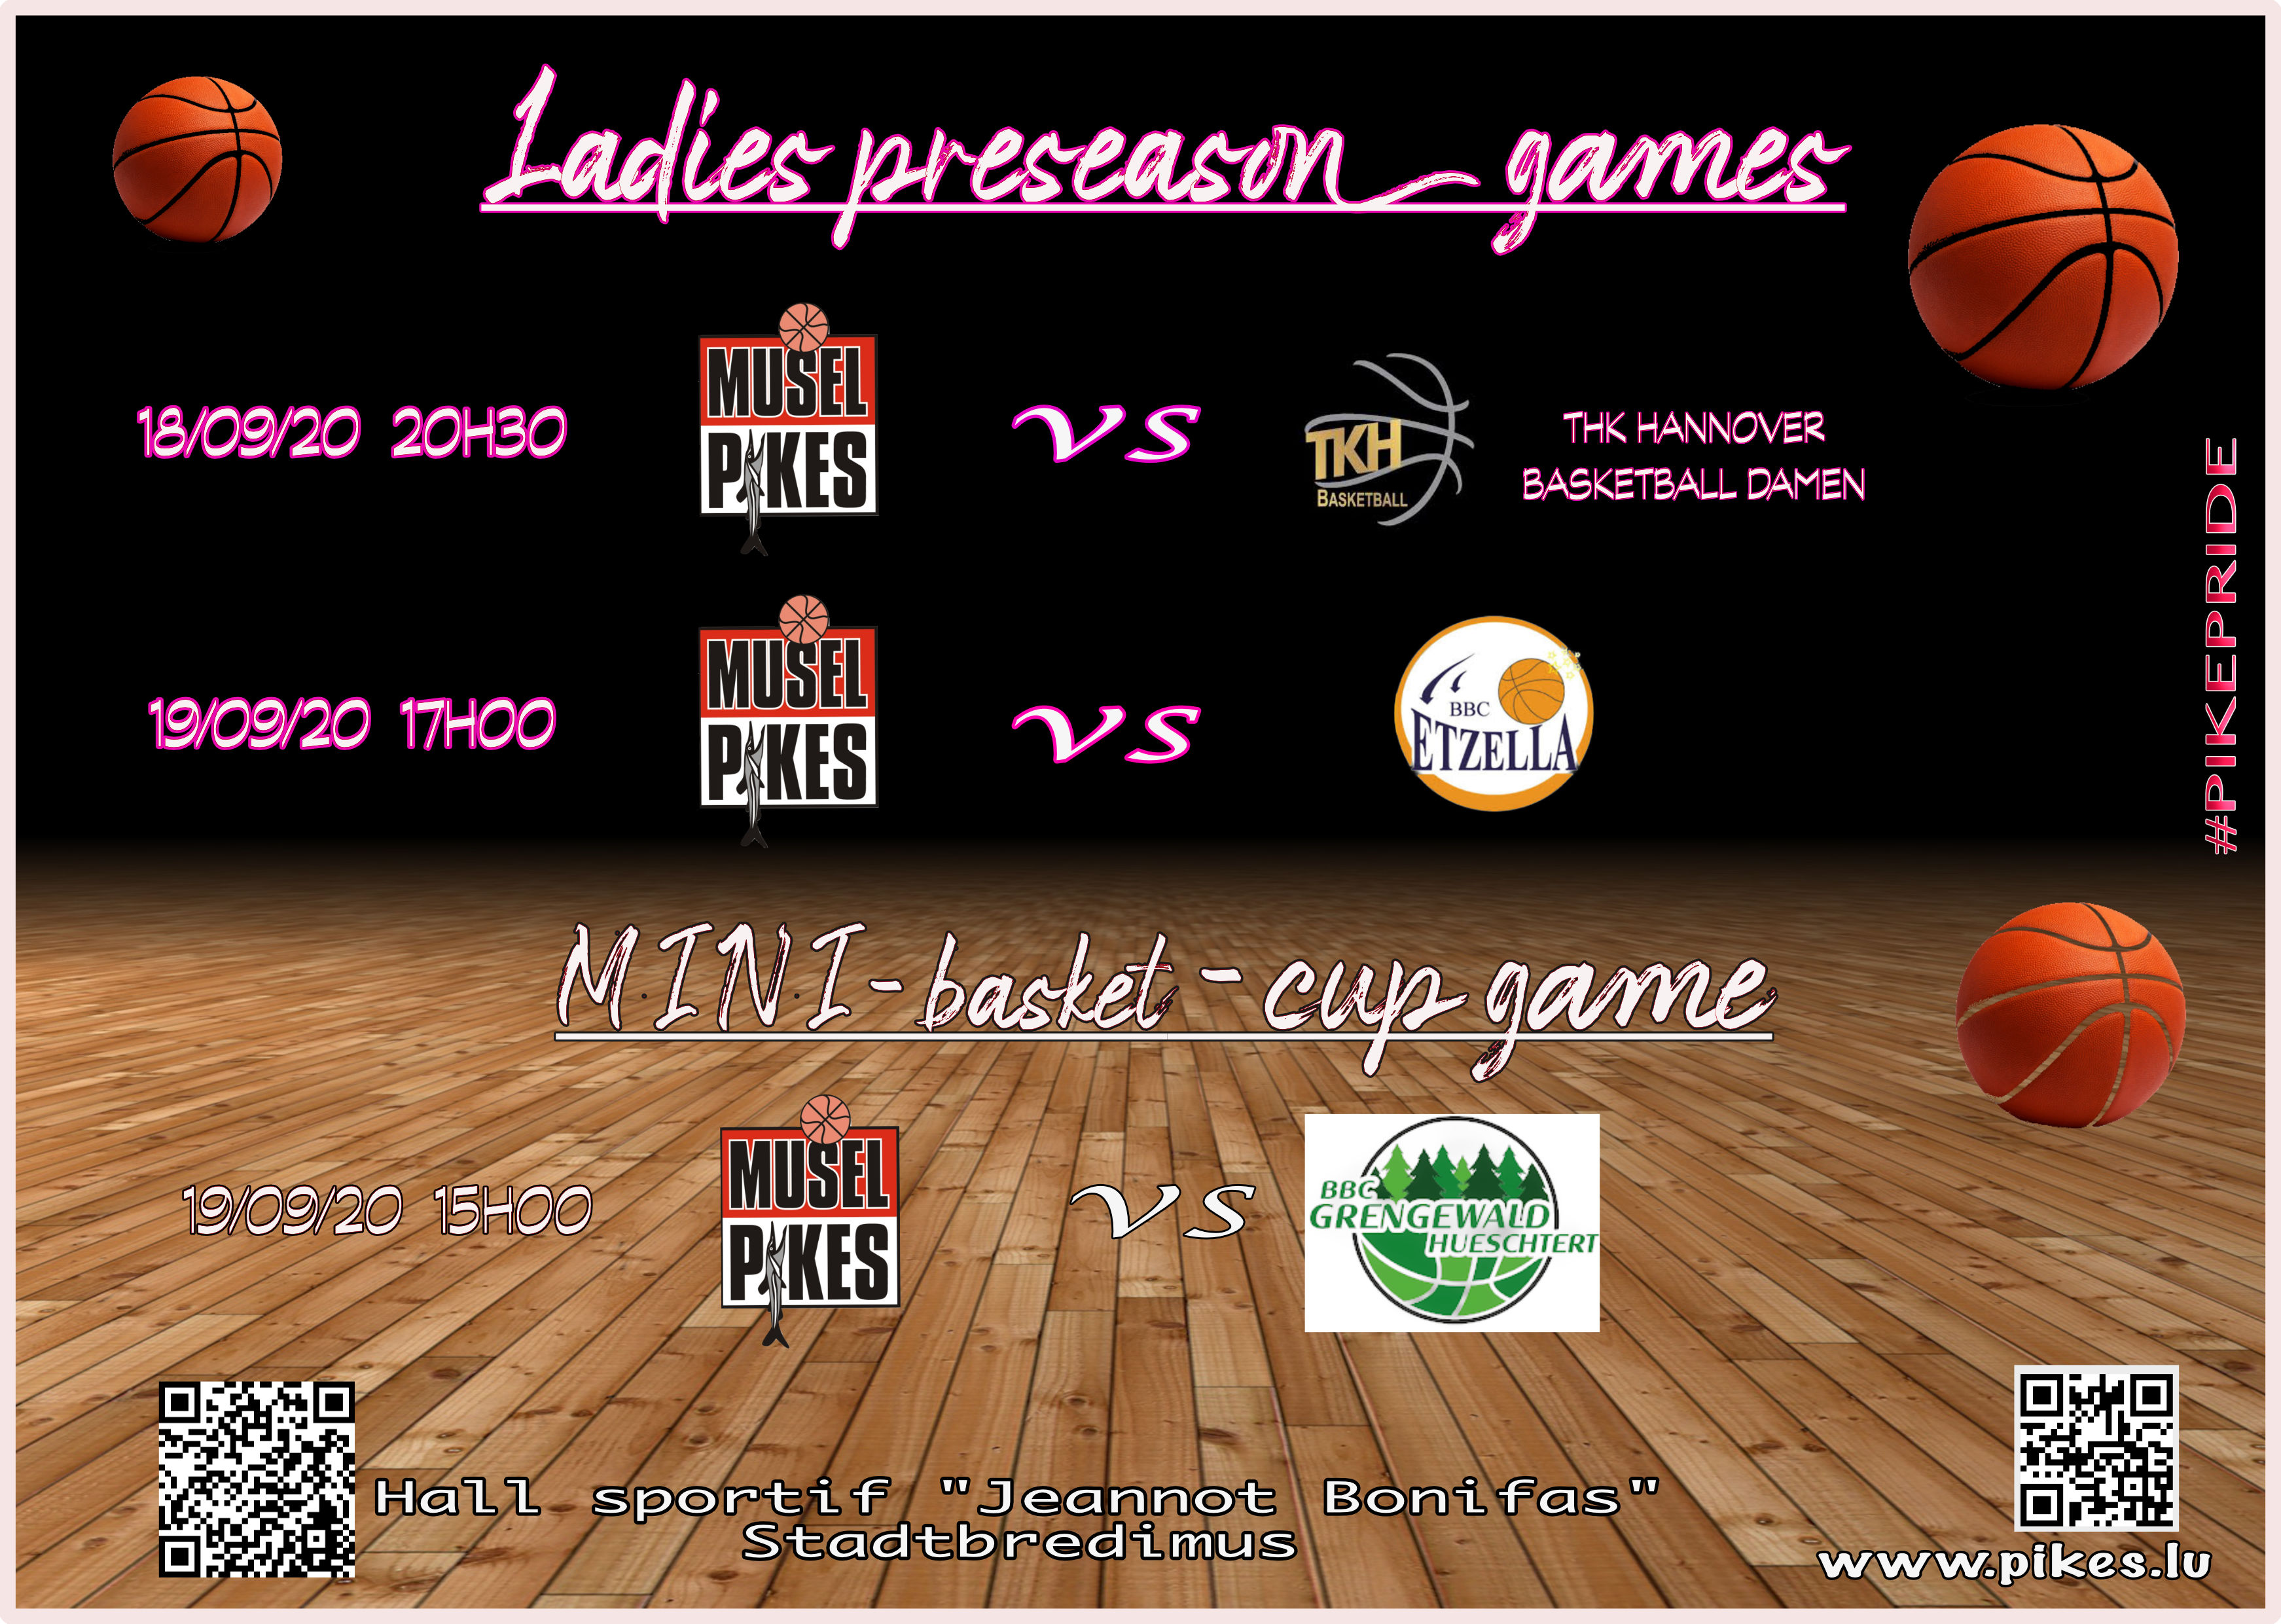 Pikes ladies preseason games & Mini cup game